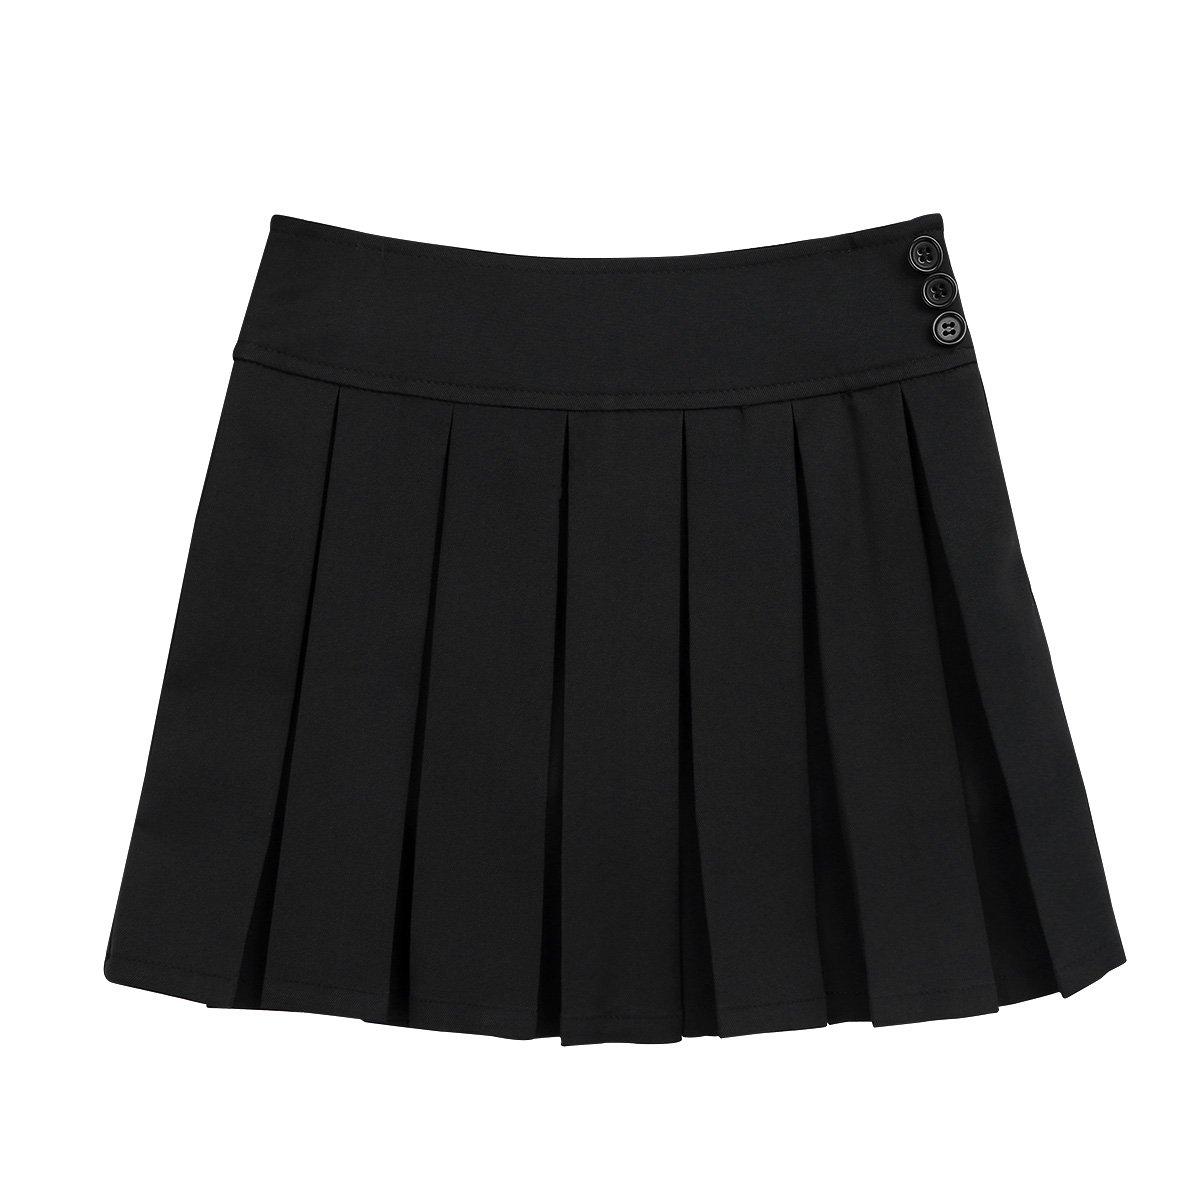 iiniim Girls School Uniform Skirt Pleated Scooters Skort Mini Skirt with Hidden Shorts Black 12